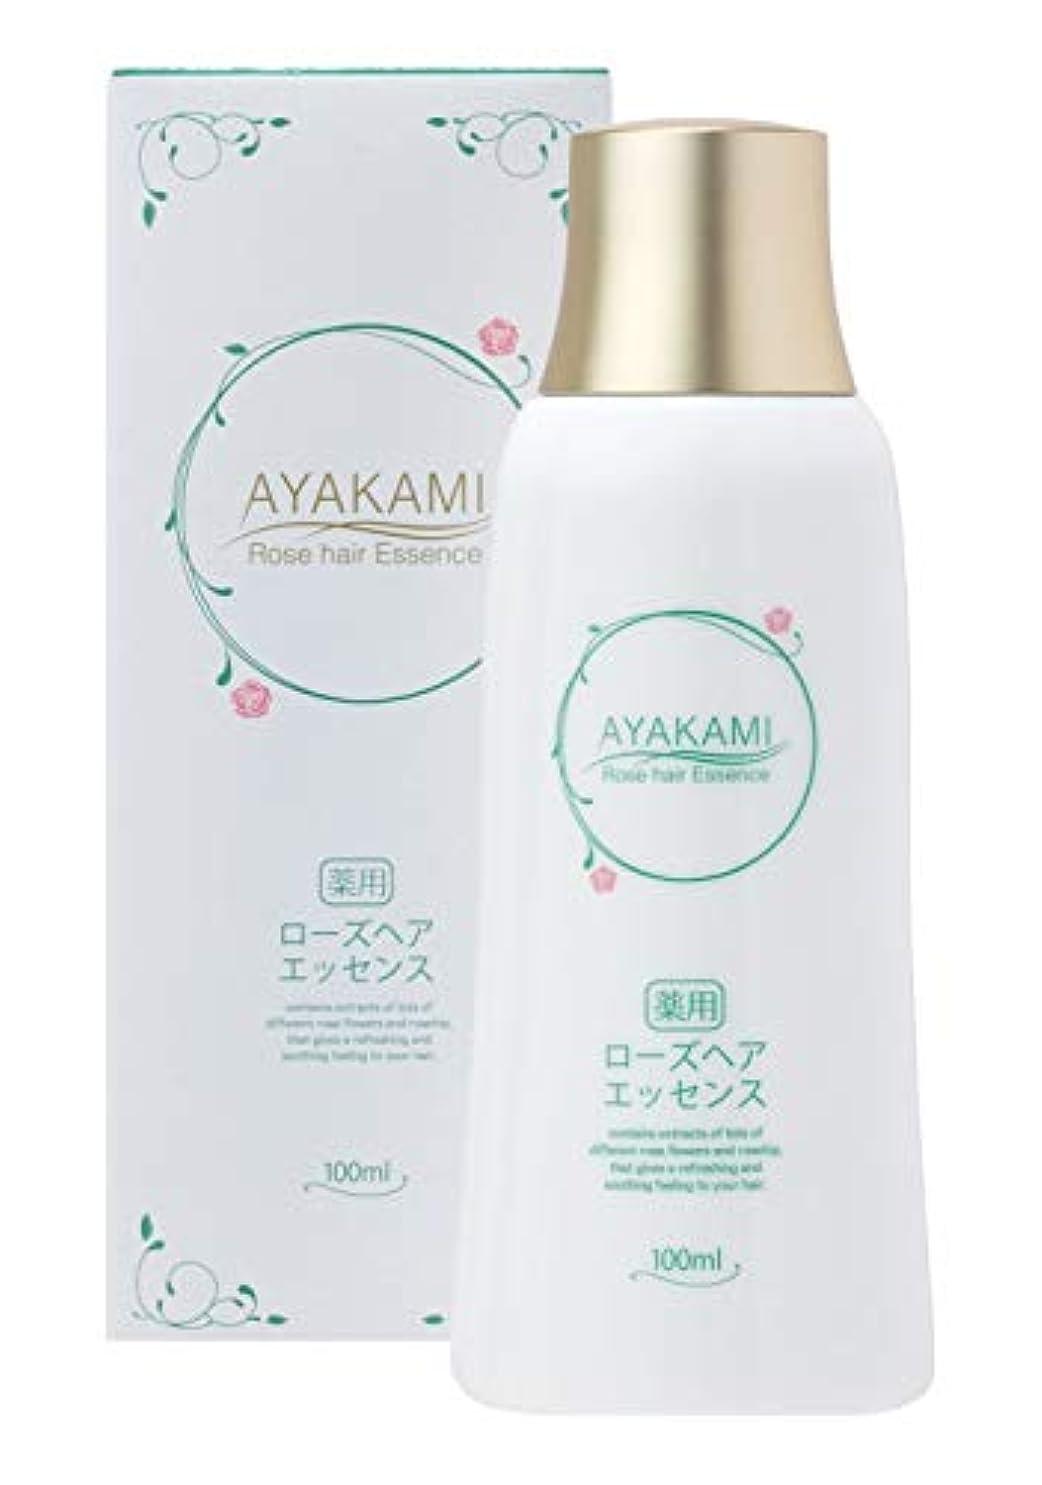 AYAKAMI ~絢髪~(アヤカミ)薬用ローズヘアエッセンス 100ml